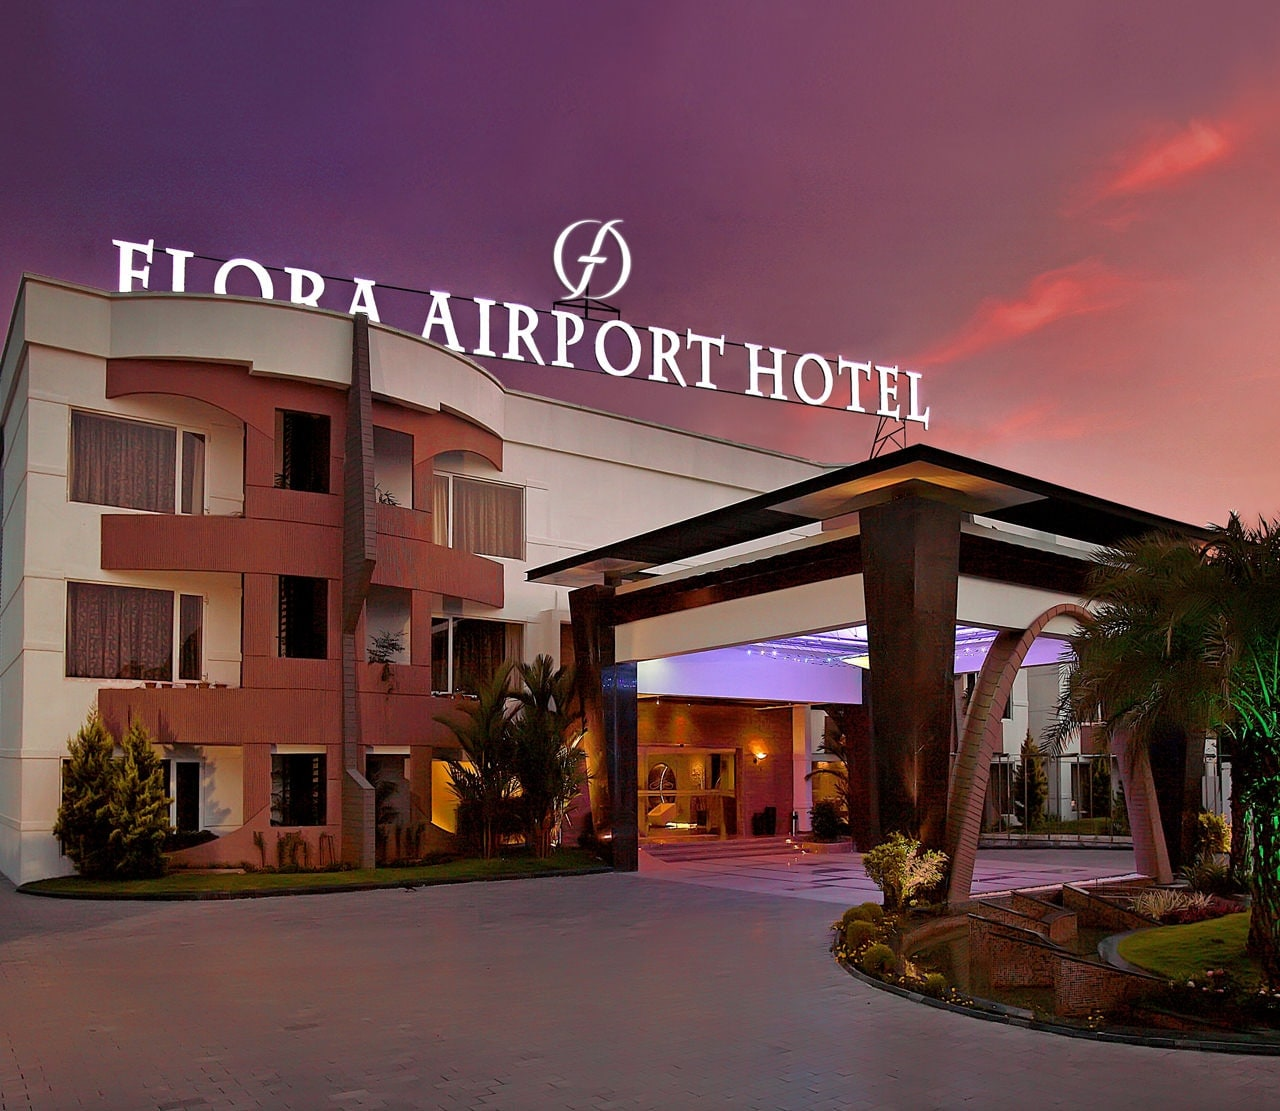 Hotel near domastic airport hotel hotel near by airport veg hotel - Hotel Near Domastic Airport Hotel Hotel Near By Airport Veg Hotel 5